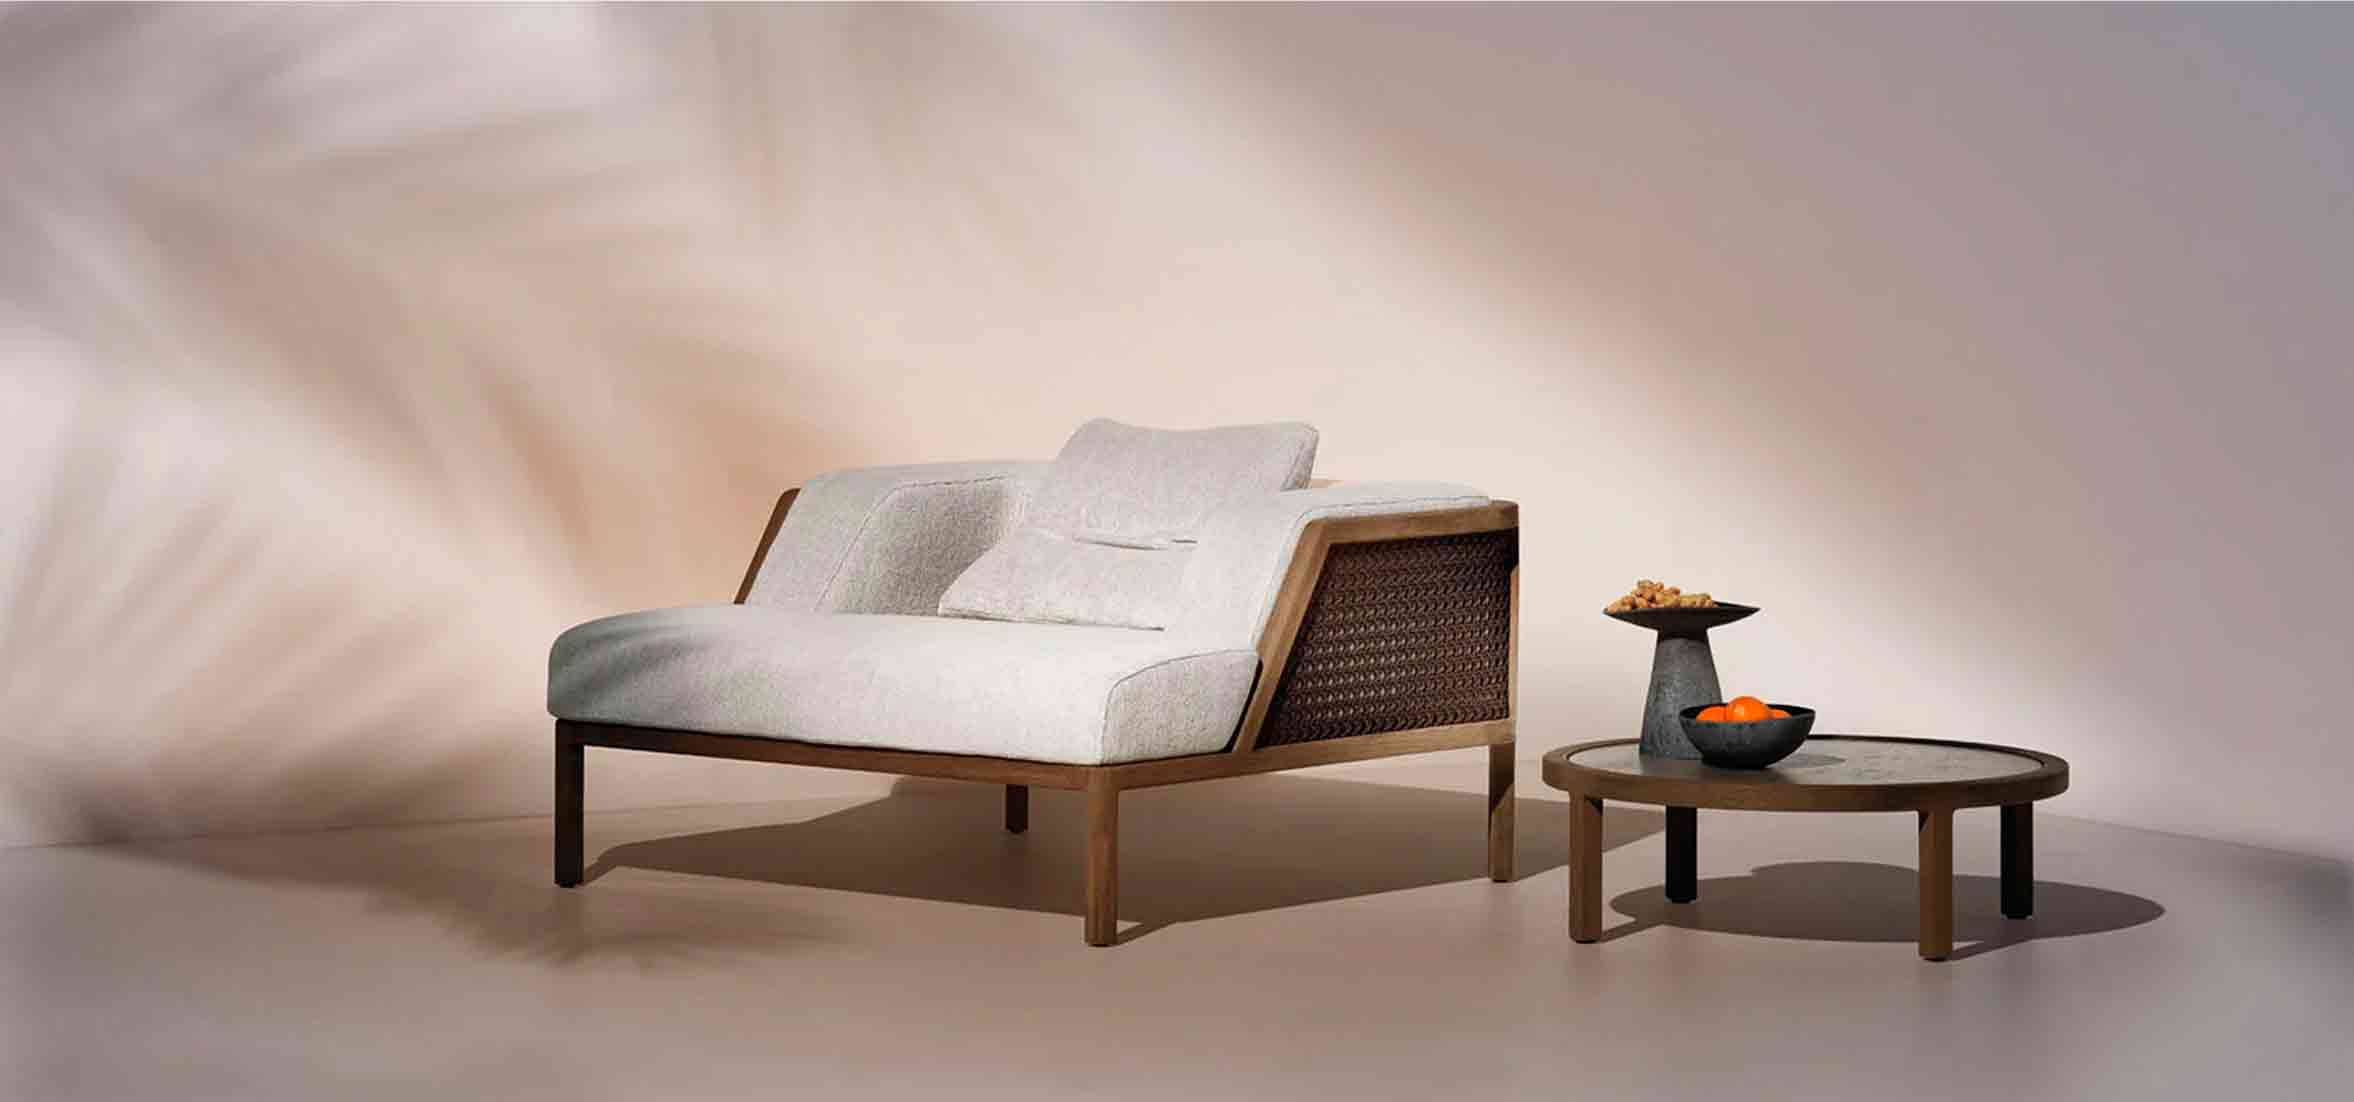 Grand life colección muebles de terraza de Ethimo en Màxim Confort Mallorca